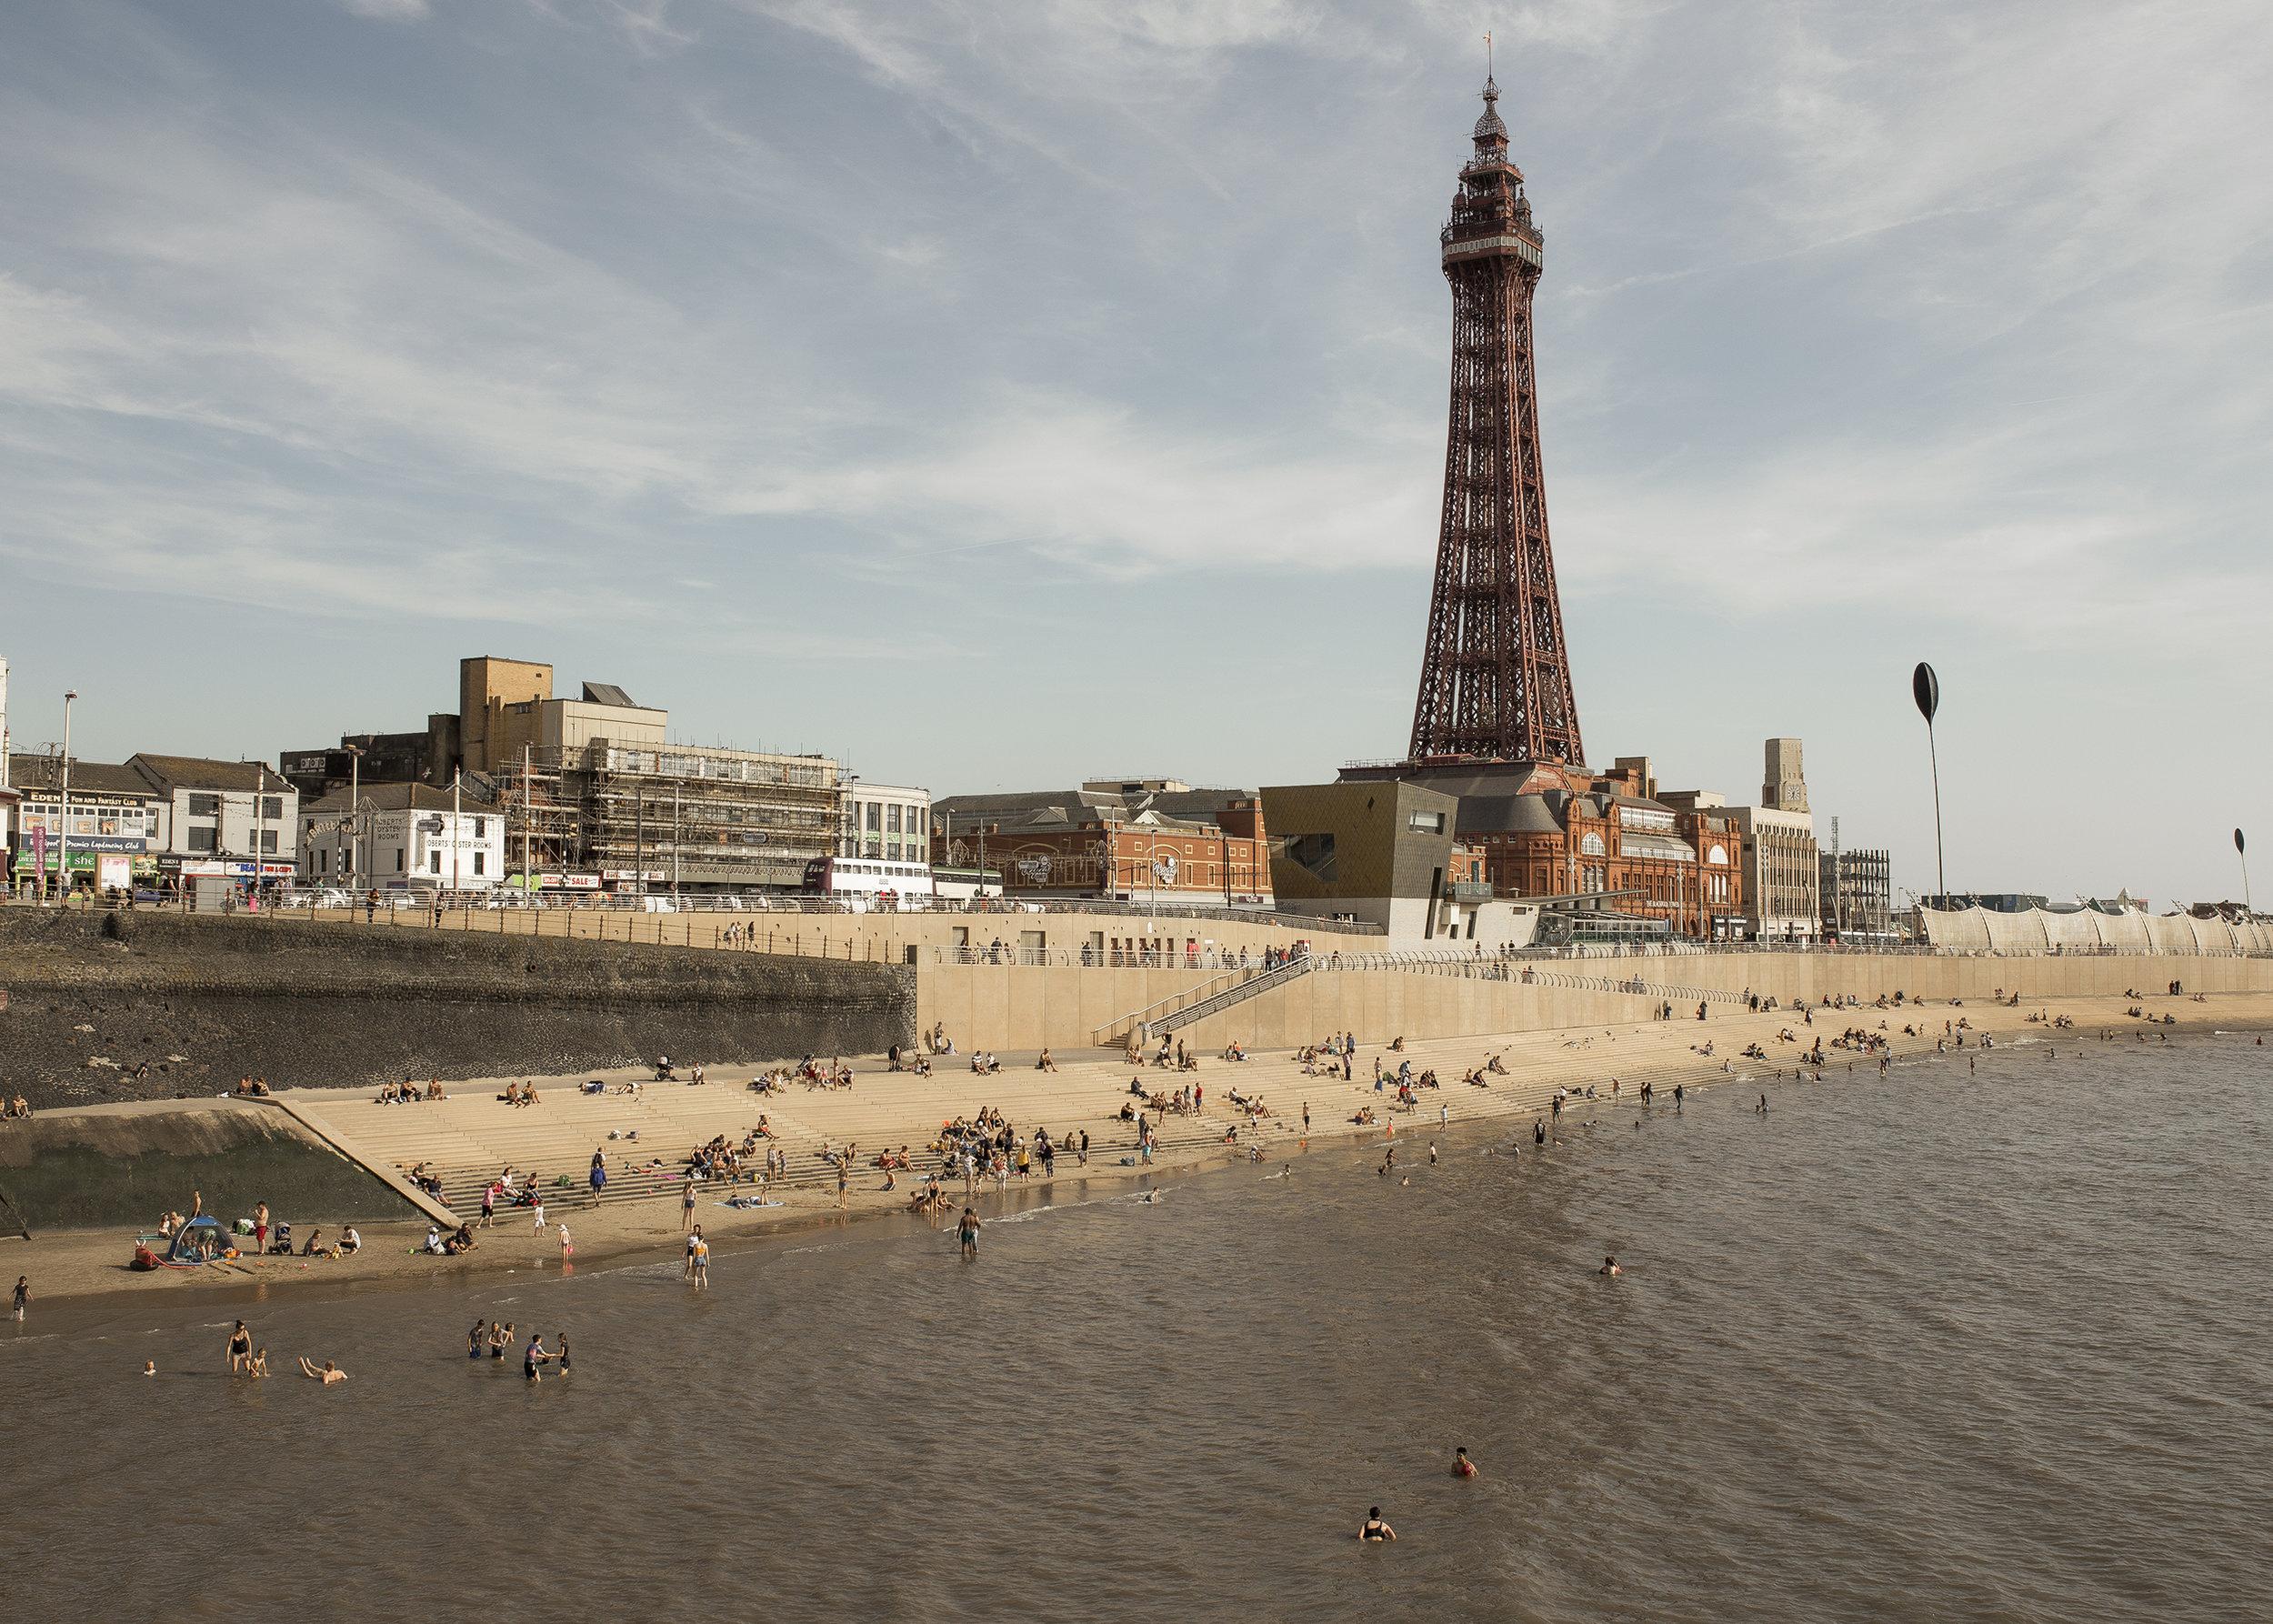 IMG_8458 beach and tower.jpg